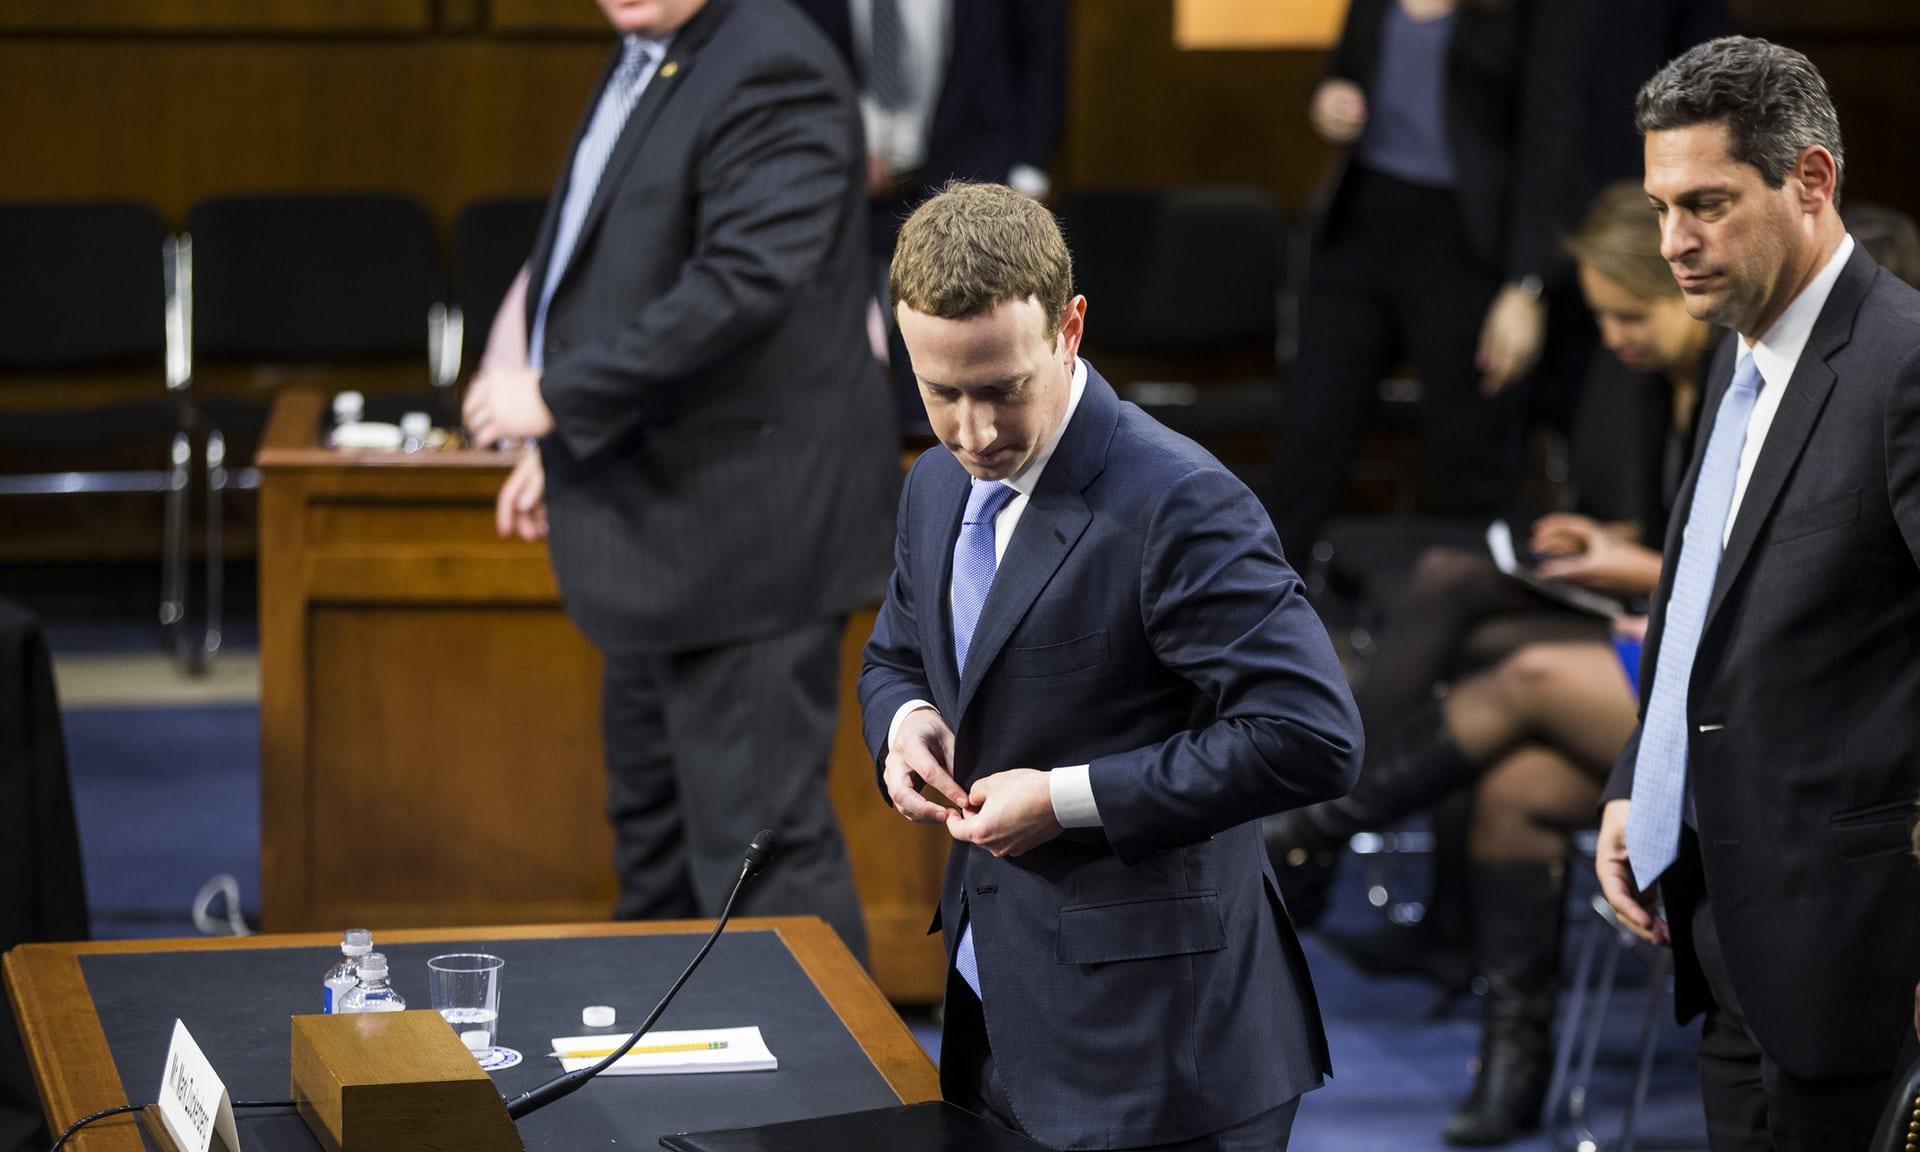 Mark Zuckerberg, the Facebook CEO, testifies before Congress. Photograph: Zach Gibson/Getty Images